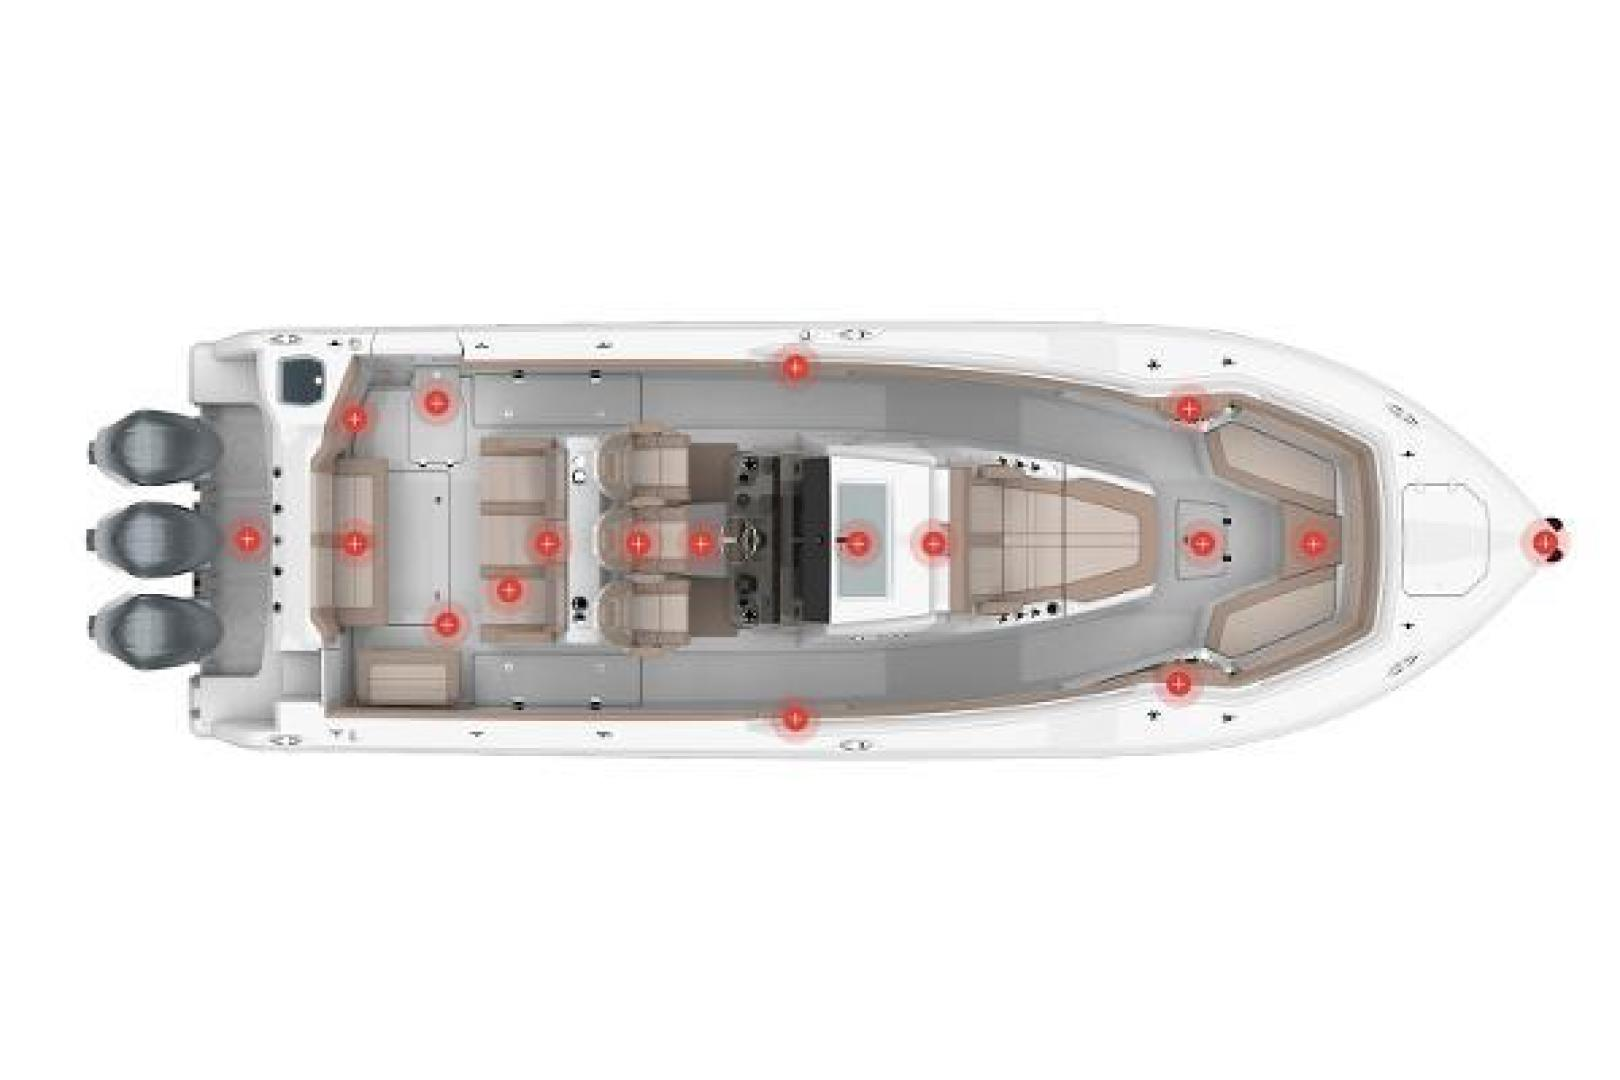 Sailfish-360 CC 2021-Sailfish 360 CC Fort Lauderdale-Florida-United States-Manufacturer Provided Image-1524516 | Thumbnail